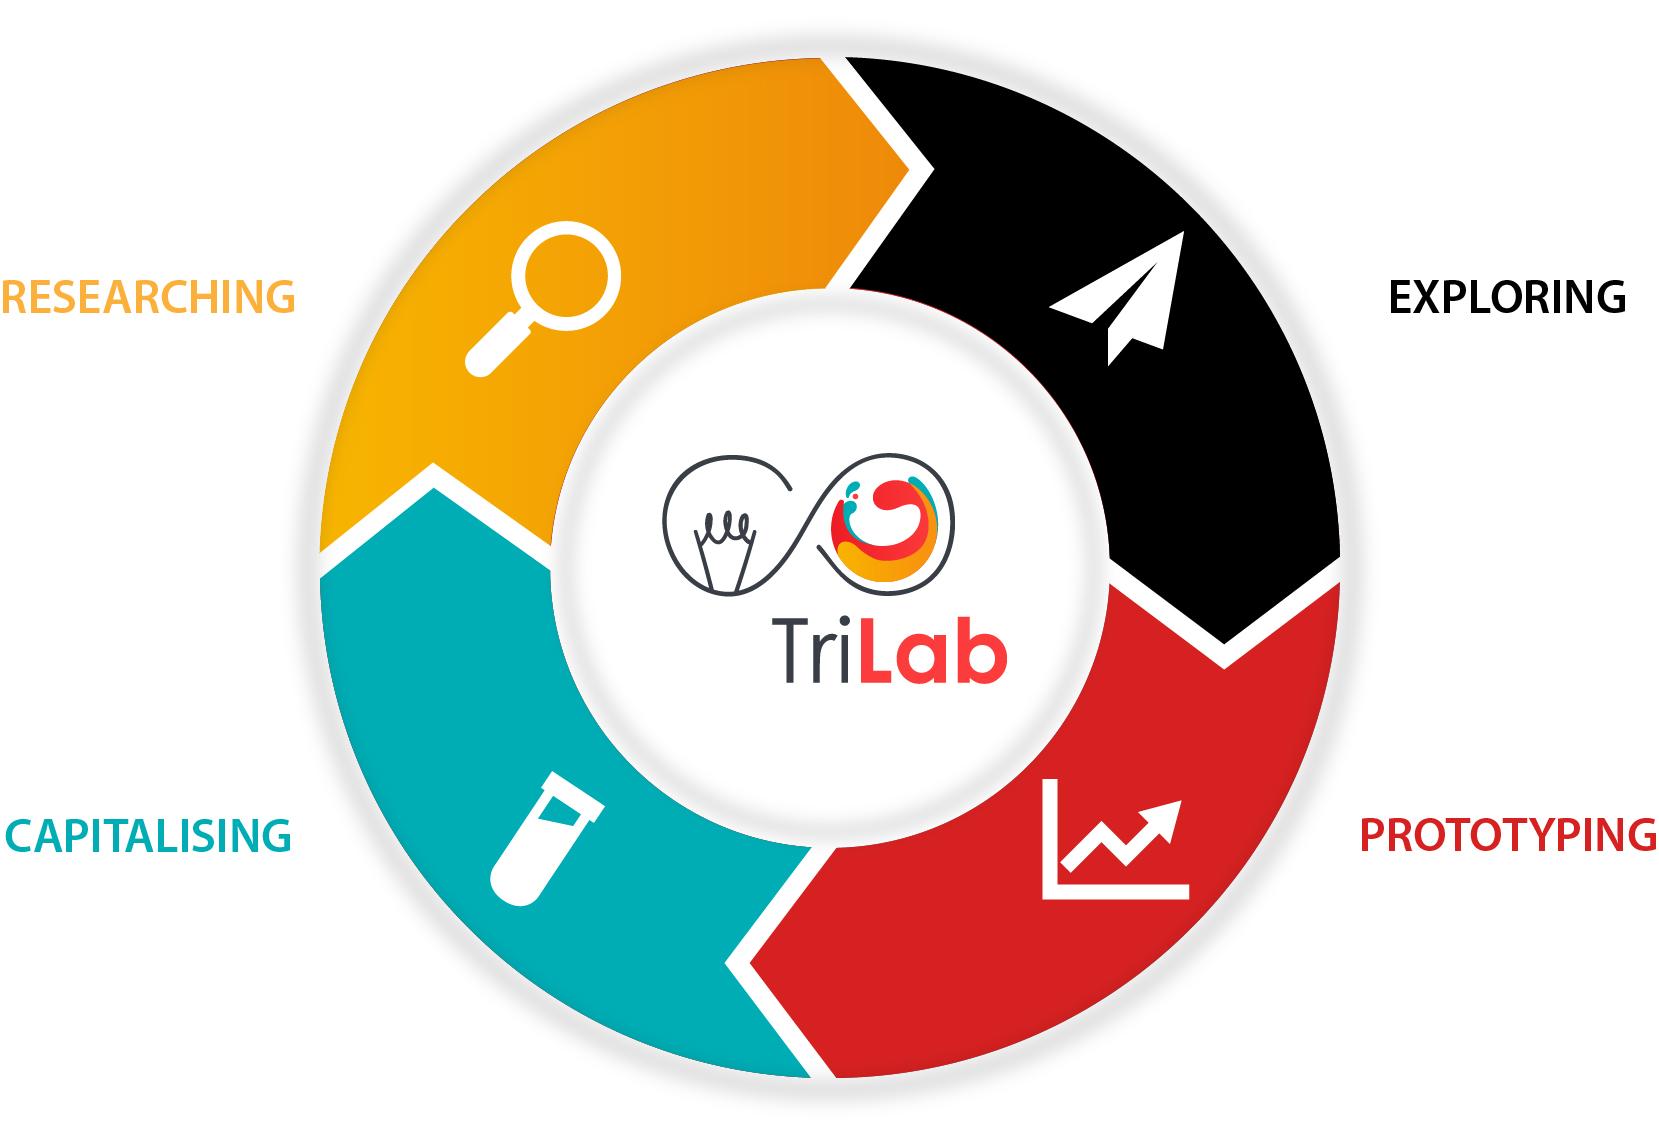 Principes du Trilab